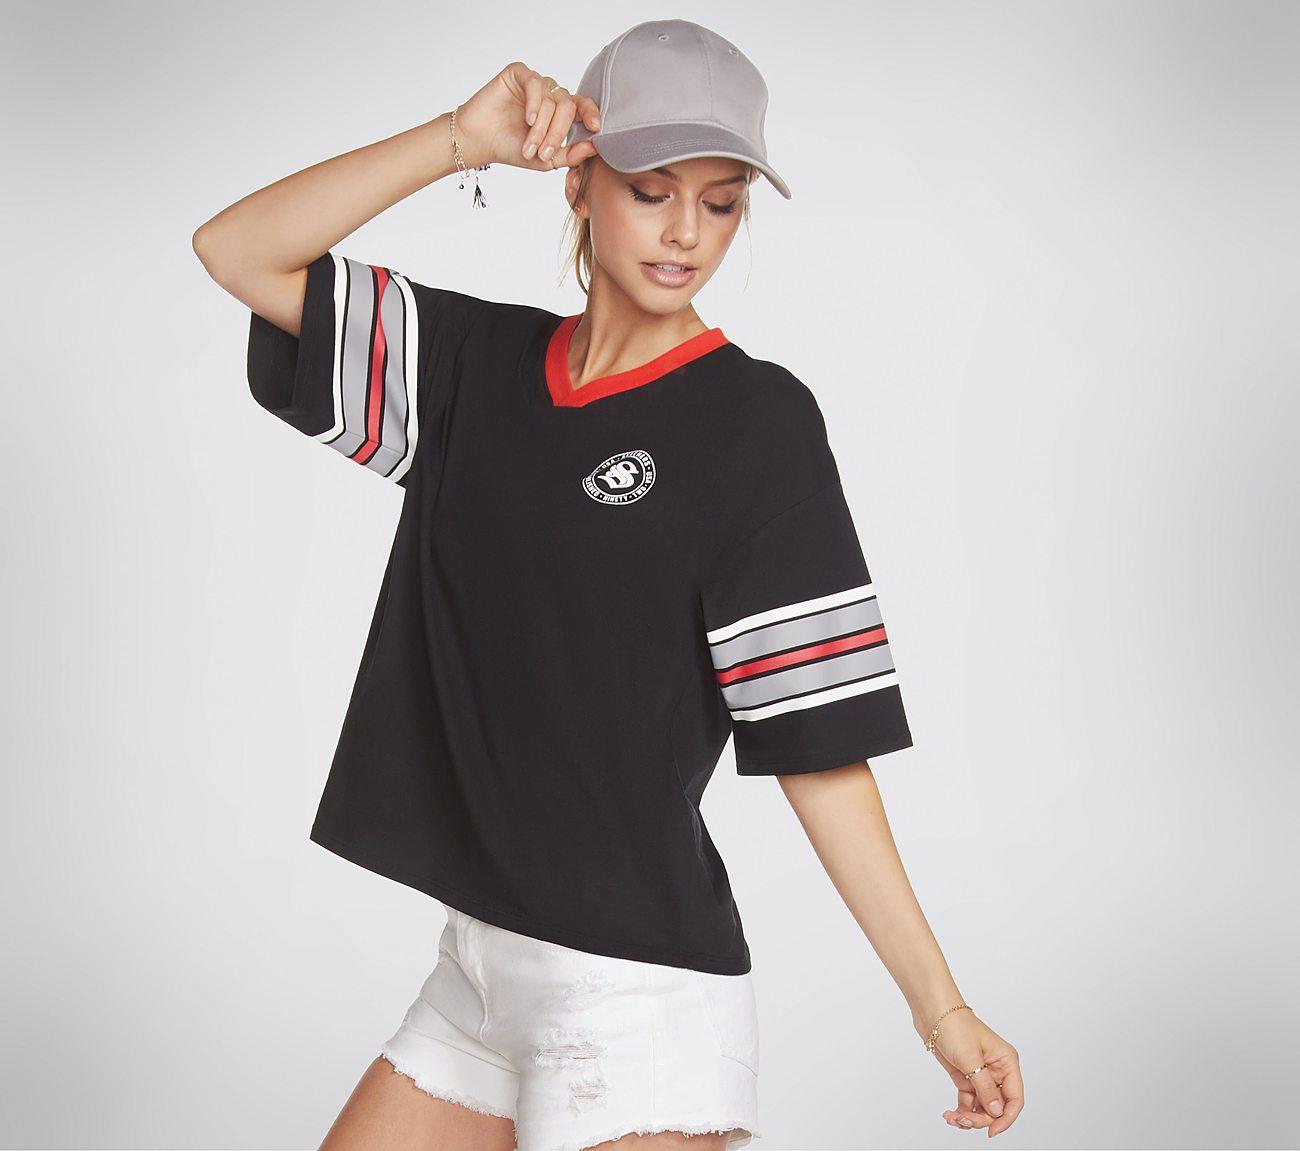 Skechers Apparel Collegiate S Tee Shirt